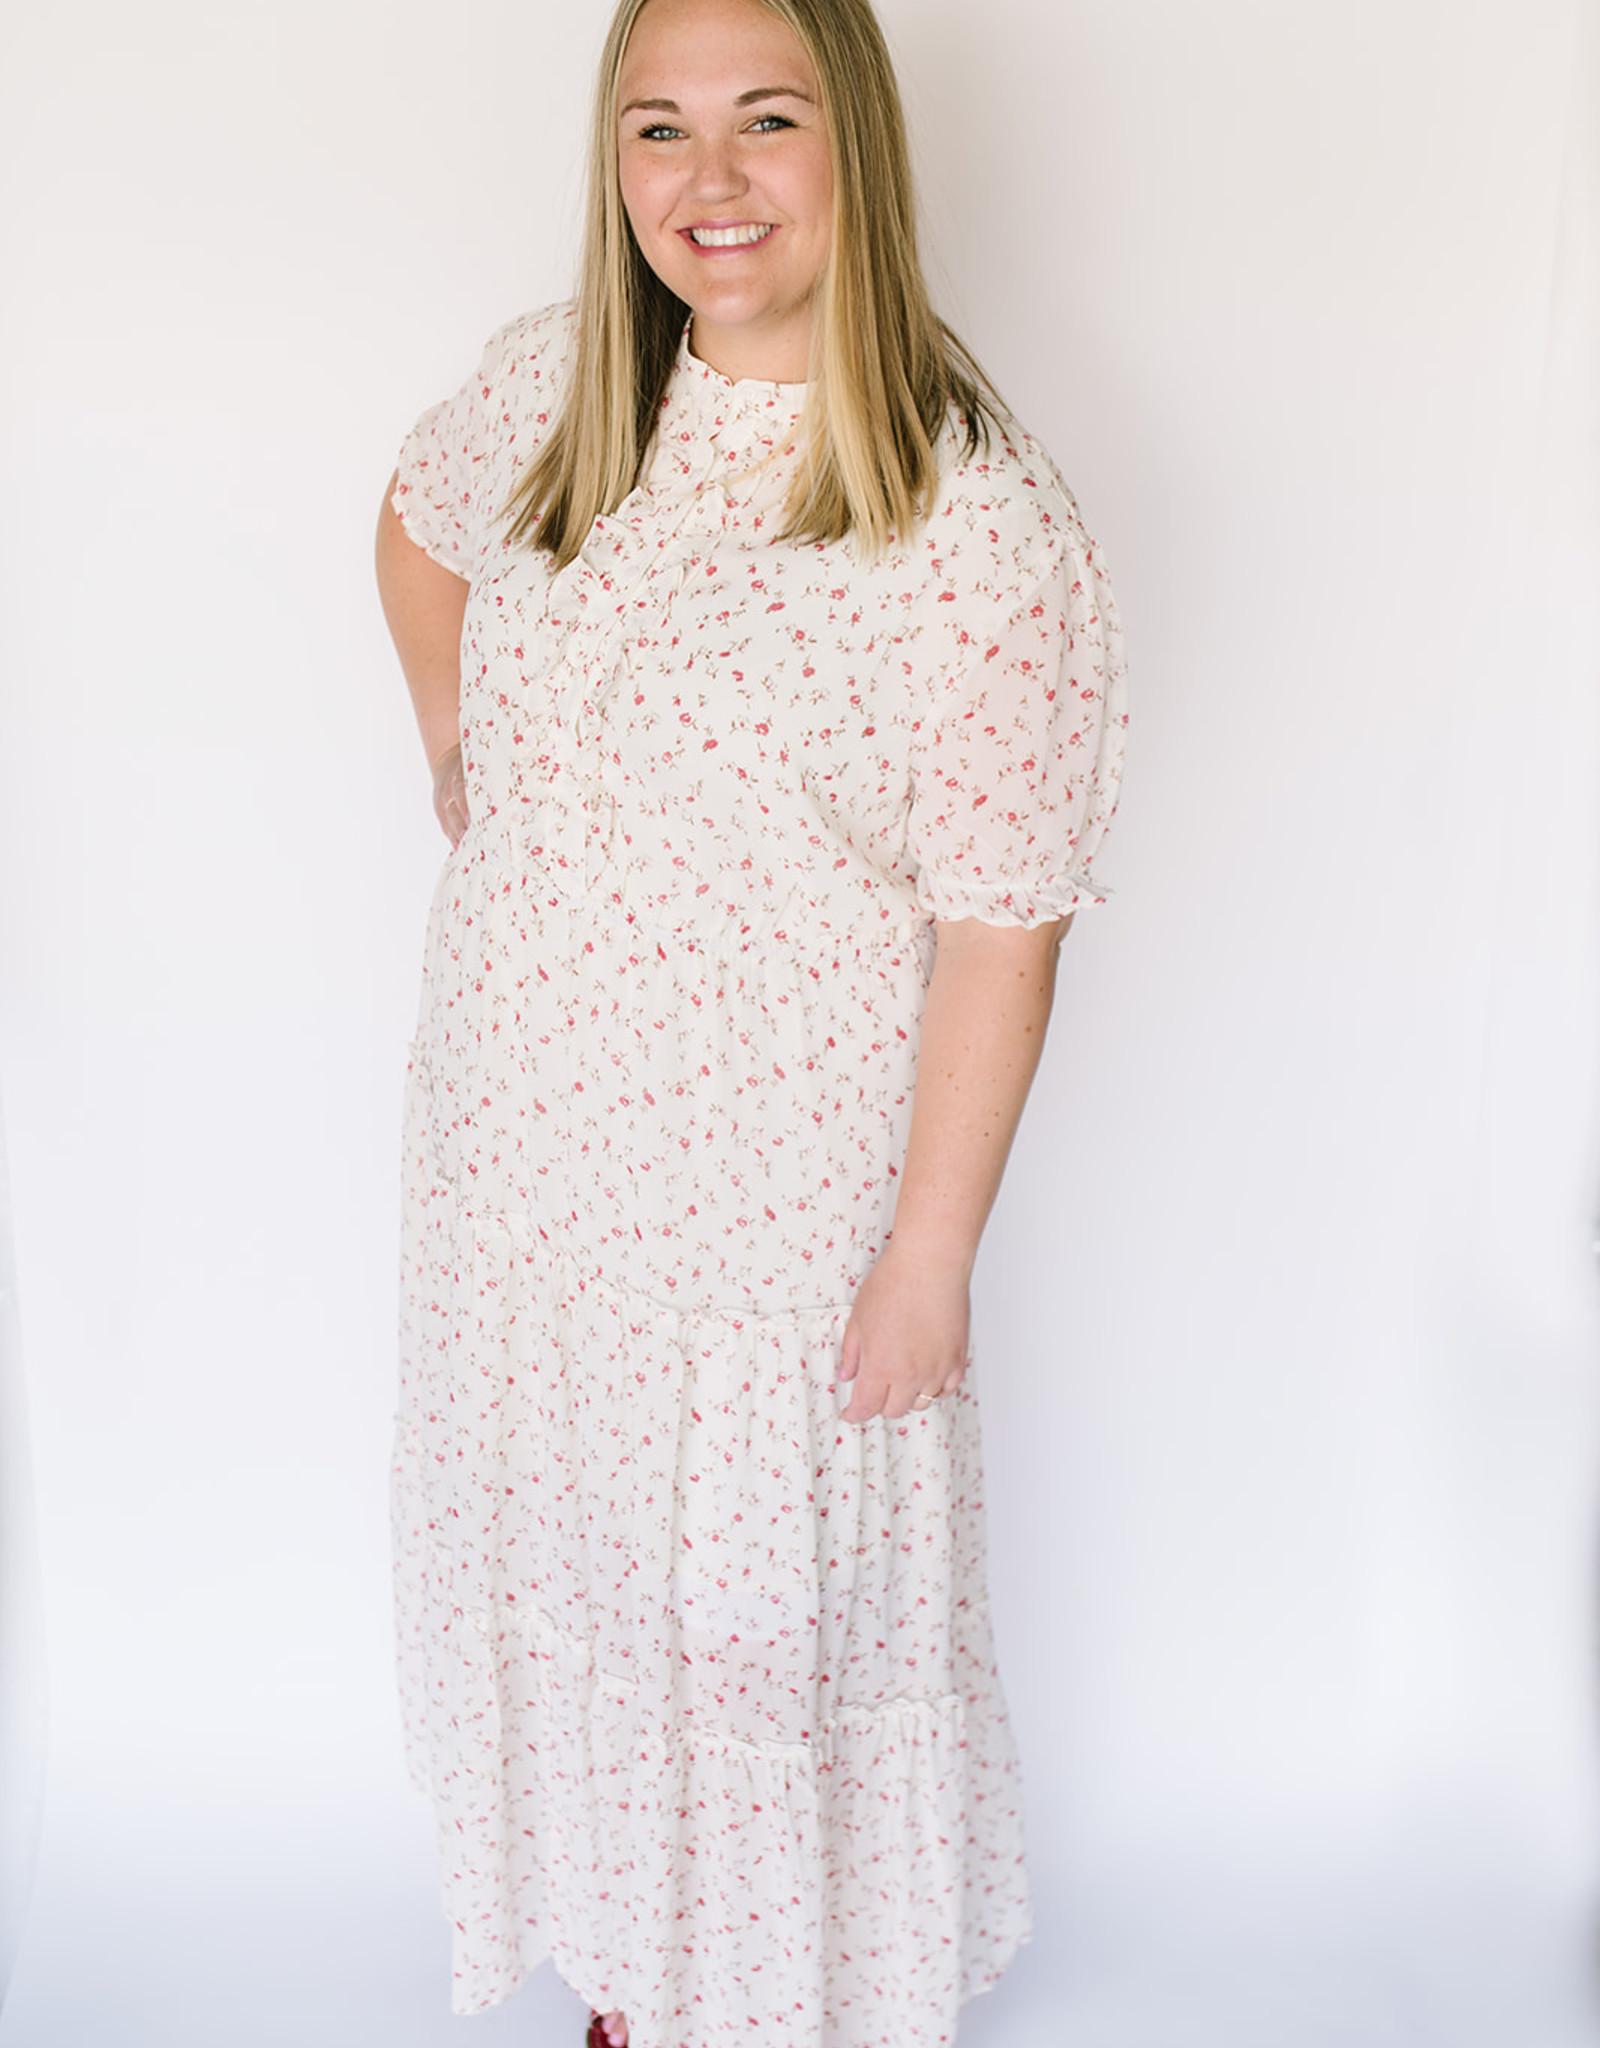 Brighton Rosebud Dress